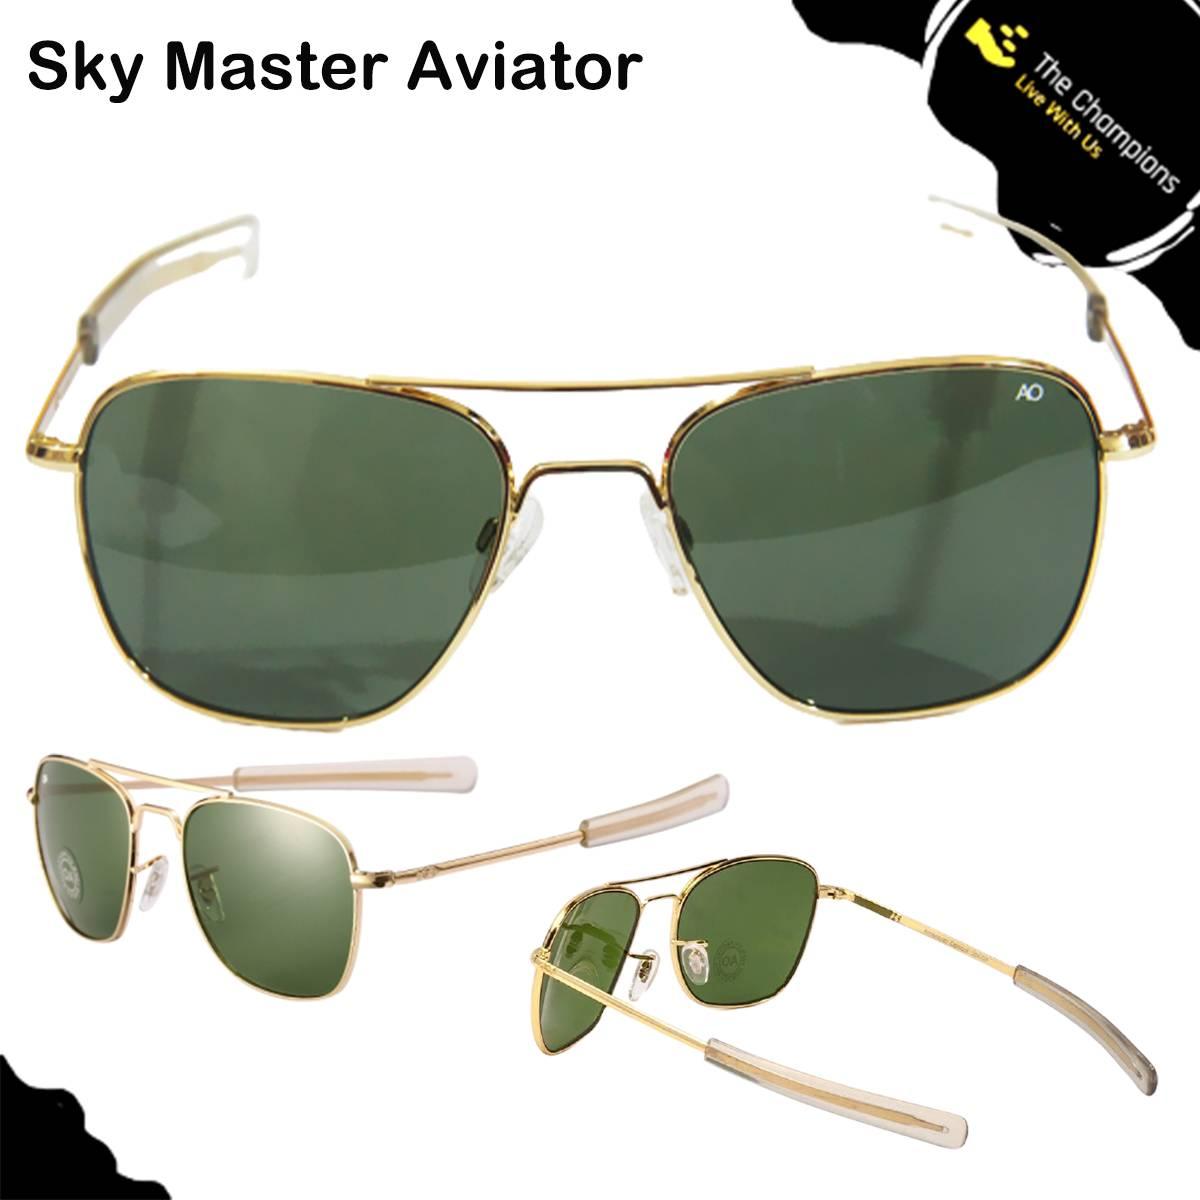 Golden Sunglass Aviator - Air Force Aviator Glasses - Aviator Sun Glasses - American Army Military Glasses Optical - Men Aviator  Sun Glasses - Women Sunglasses - Unisex Sunglasses